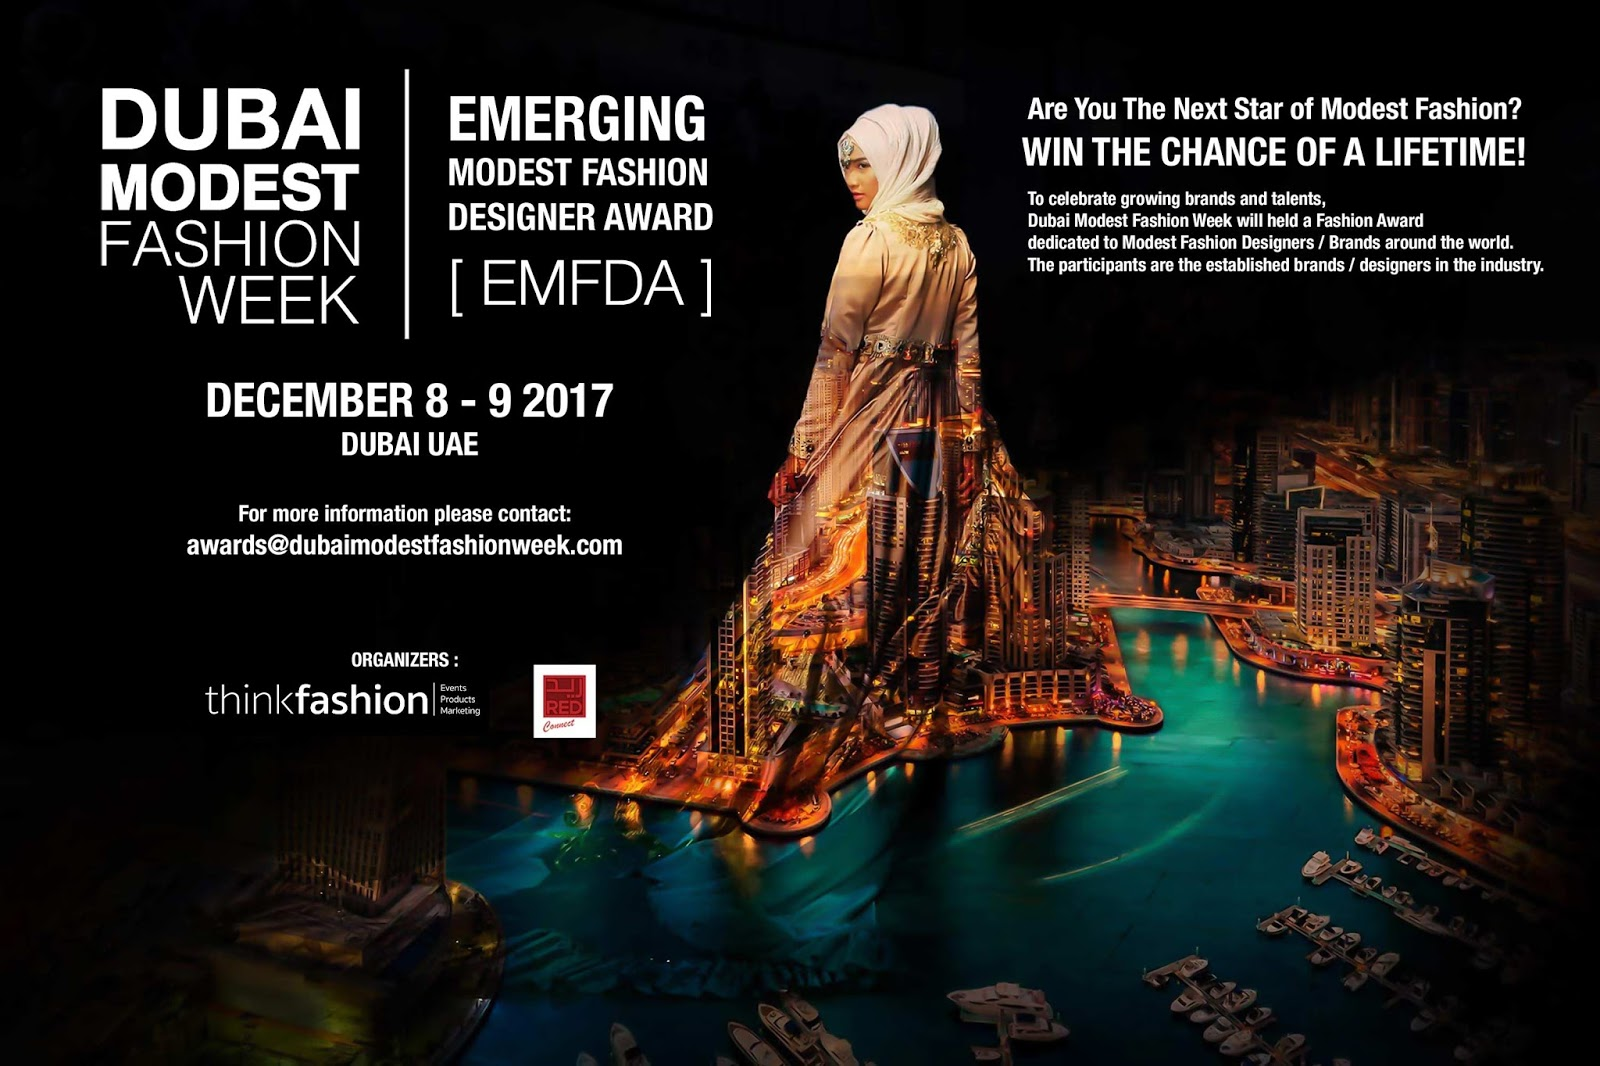 source dmfw website poster advertising the emerging modest fashion designer award